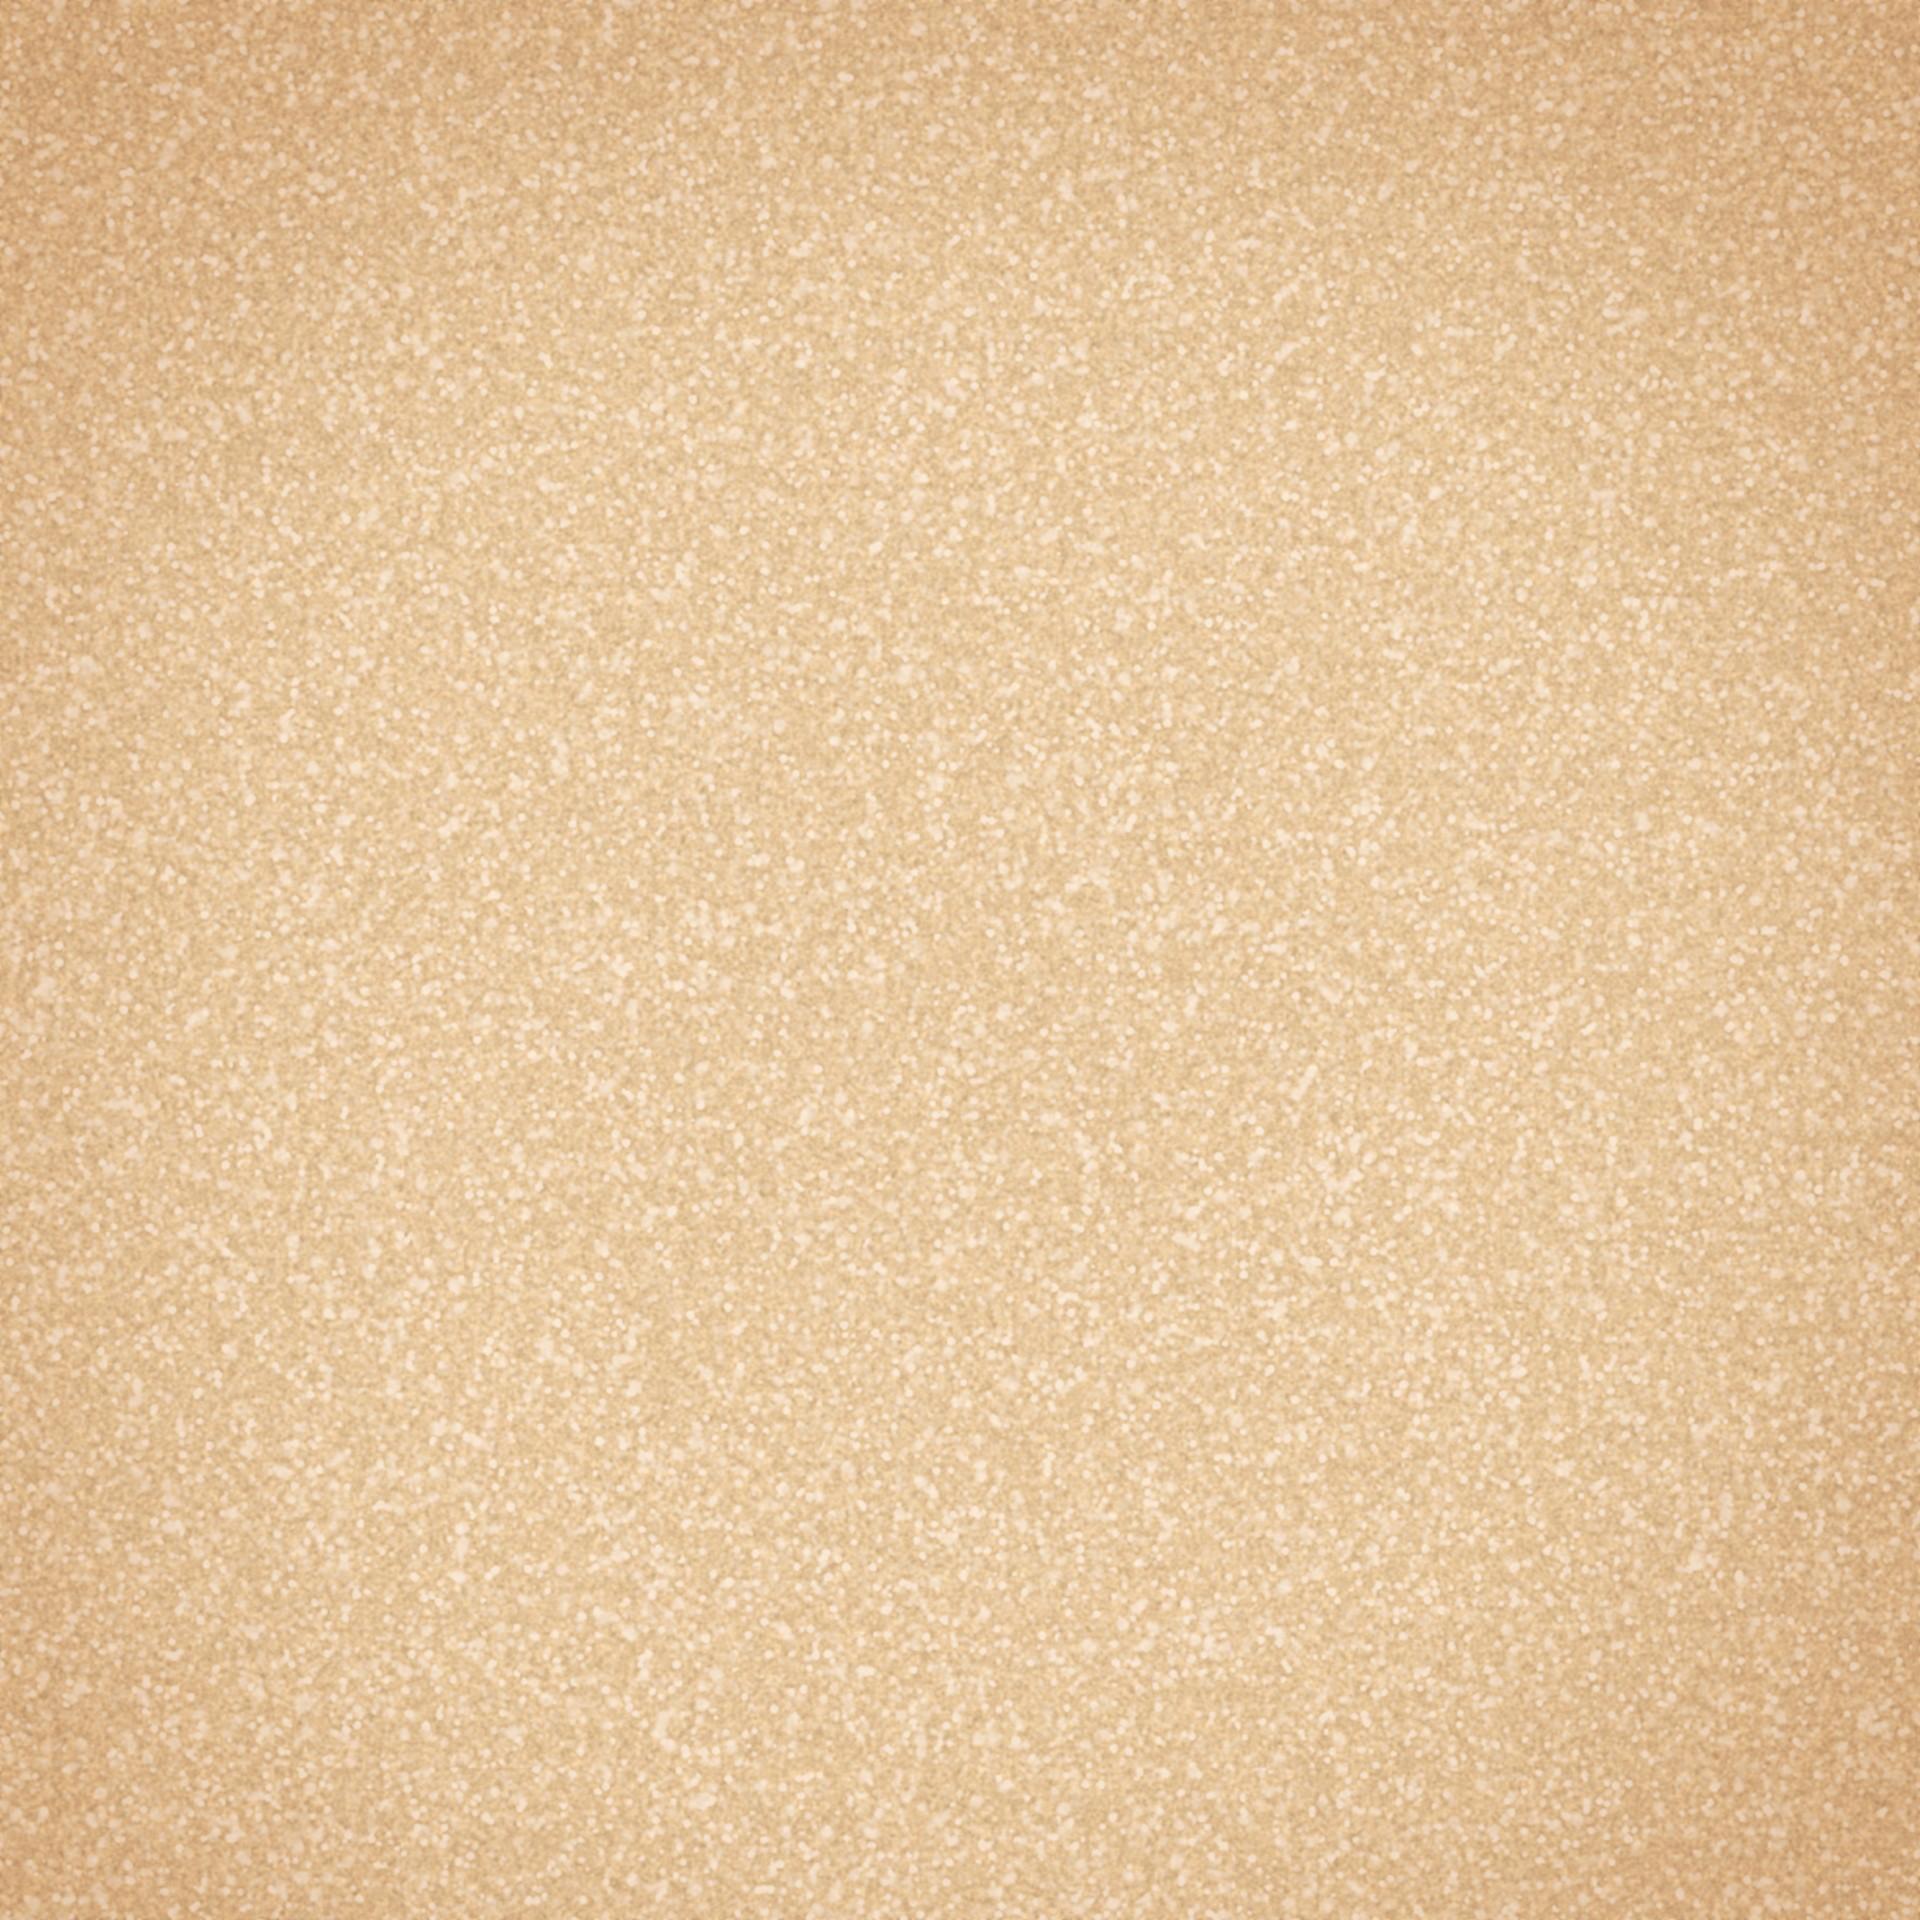 Gold Touch – Gold Shimmer No.01 - Galerie-Bild 2